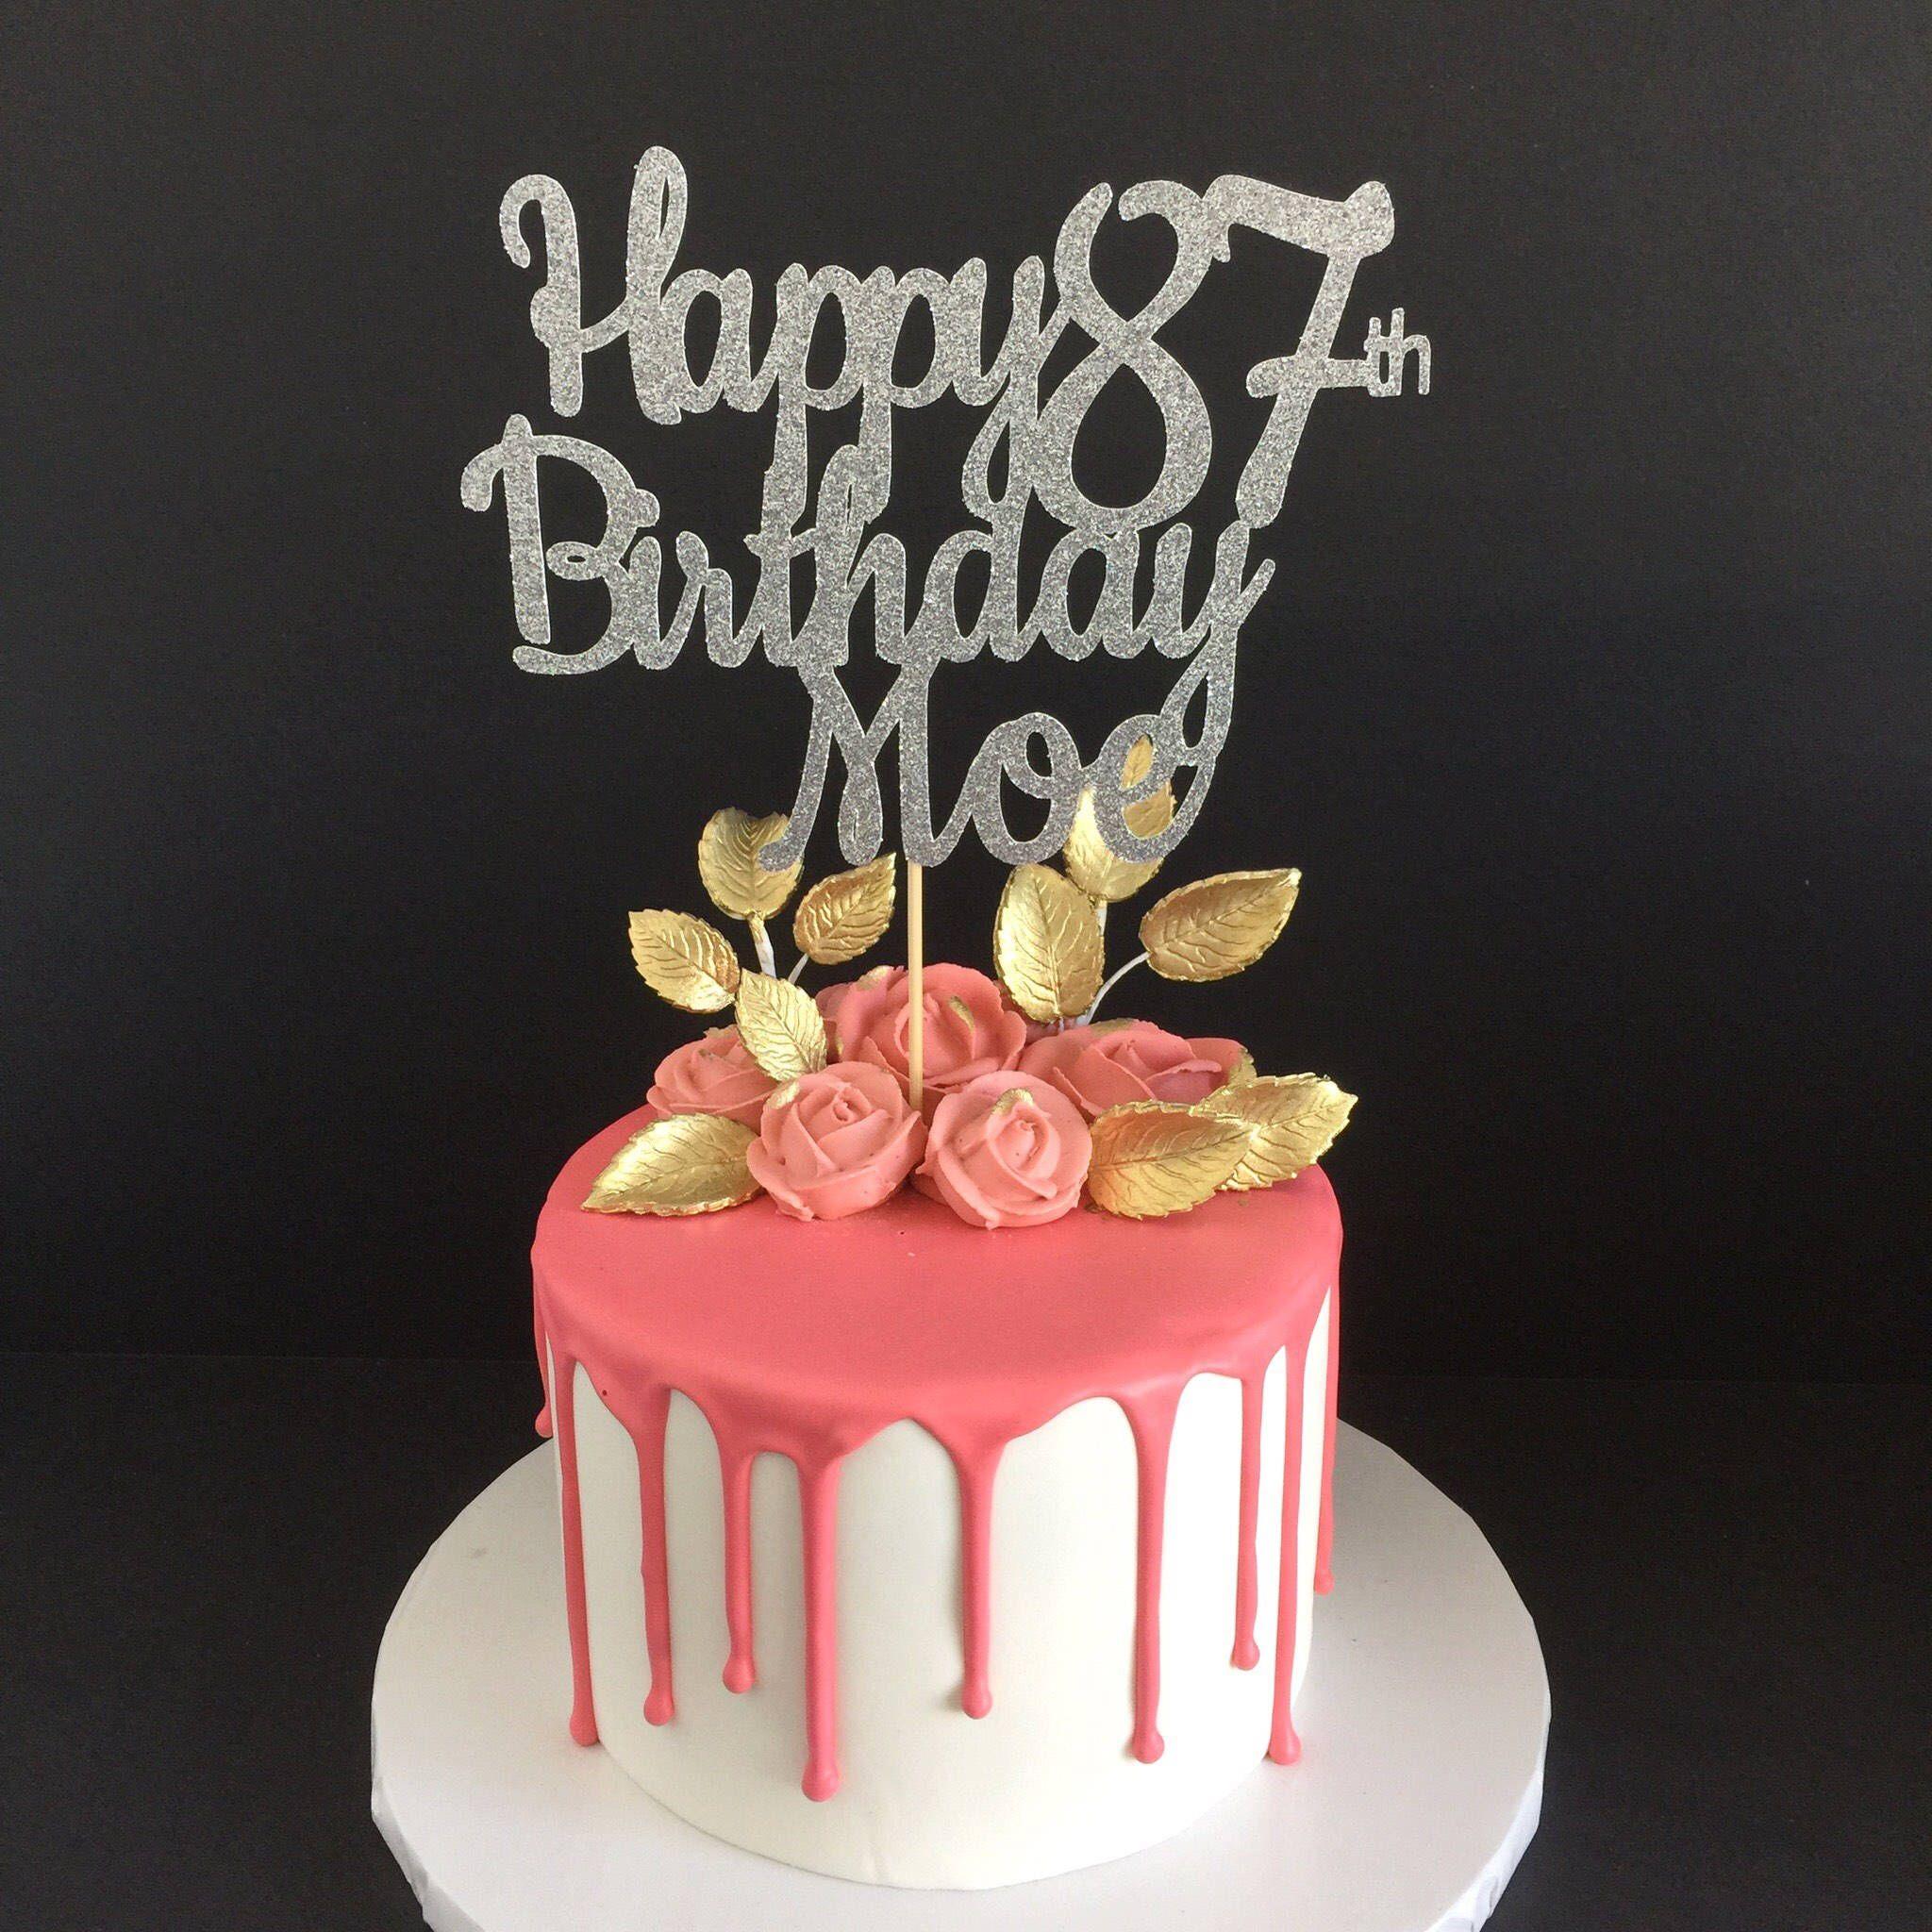 Any name any age happy birthday cake topper birthday cake